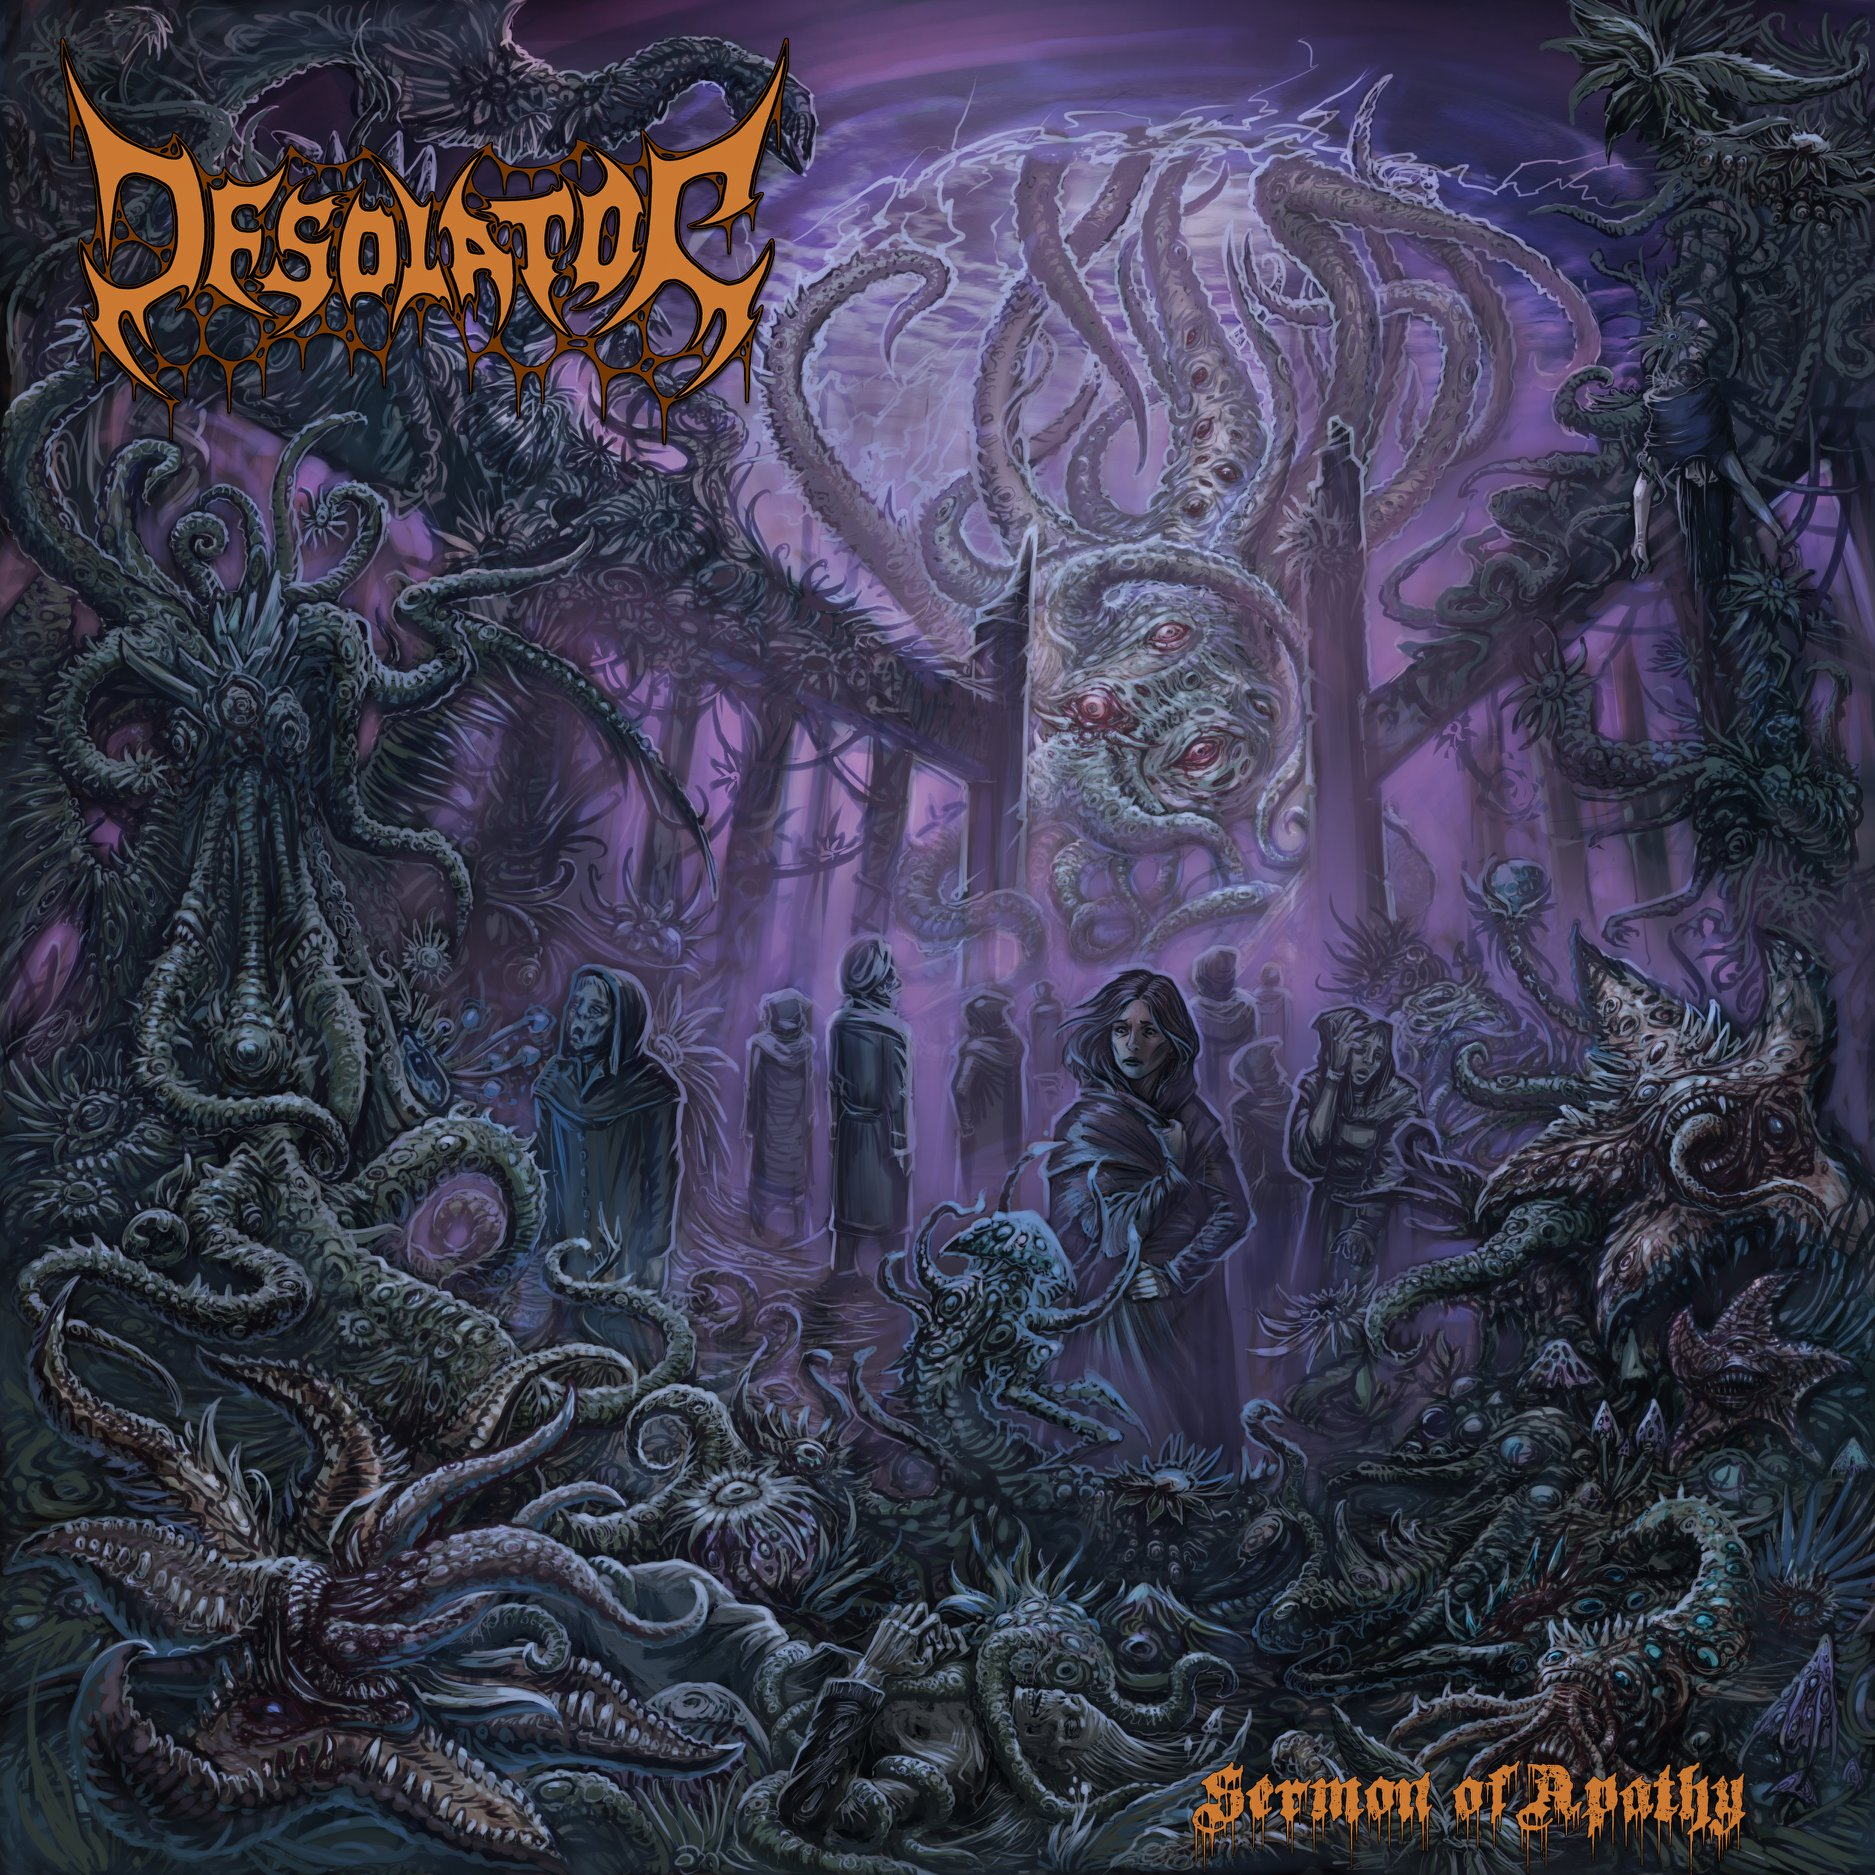 Desolator Sermon of Apathy Cover Art